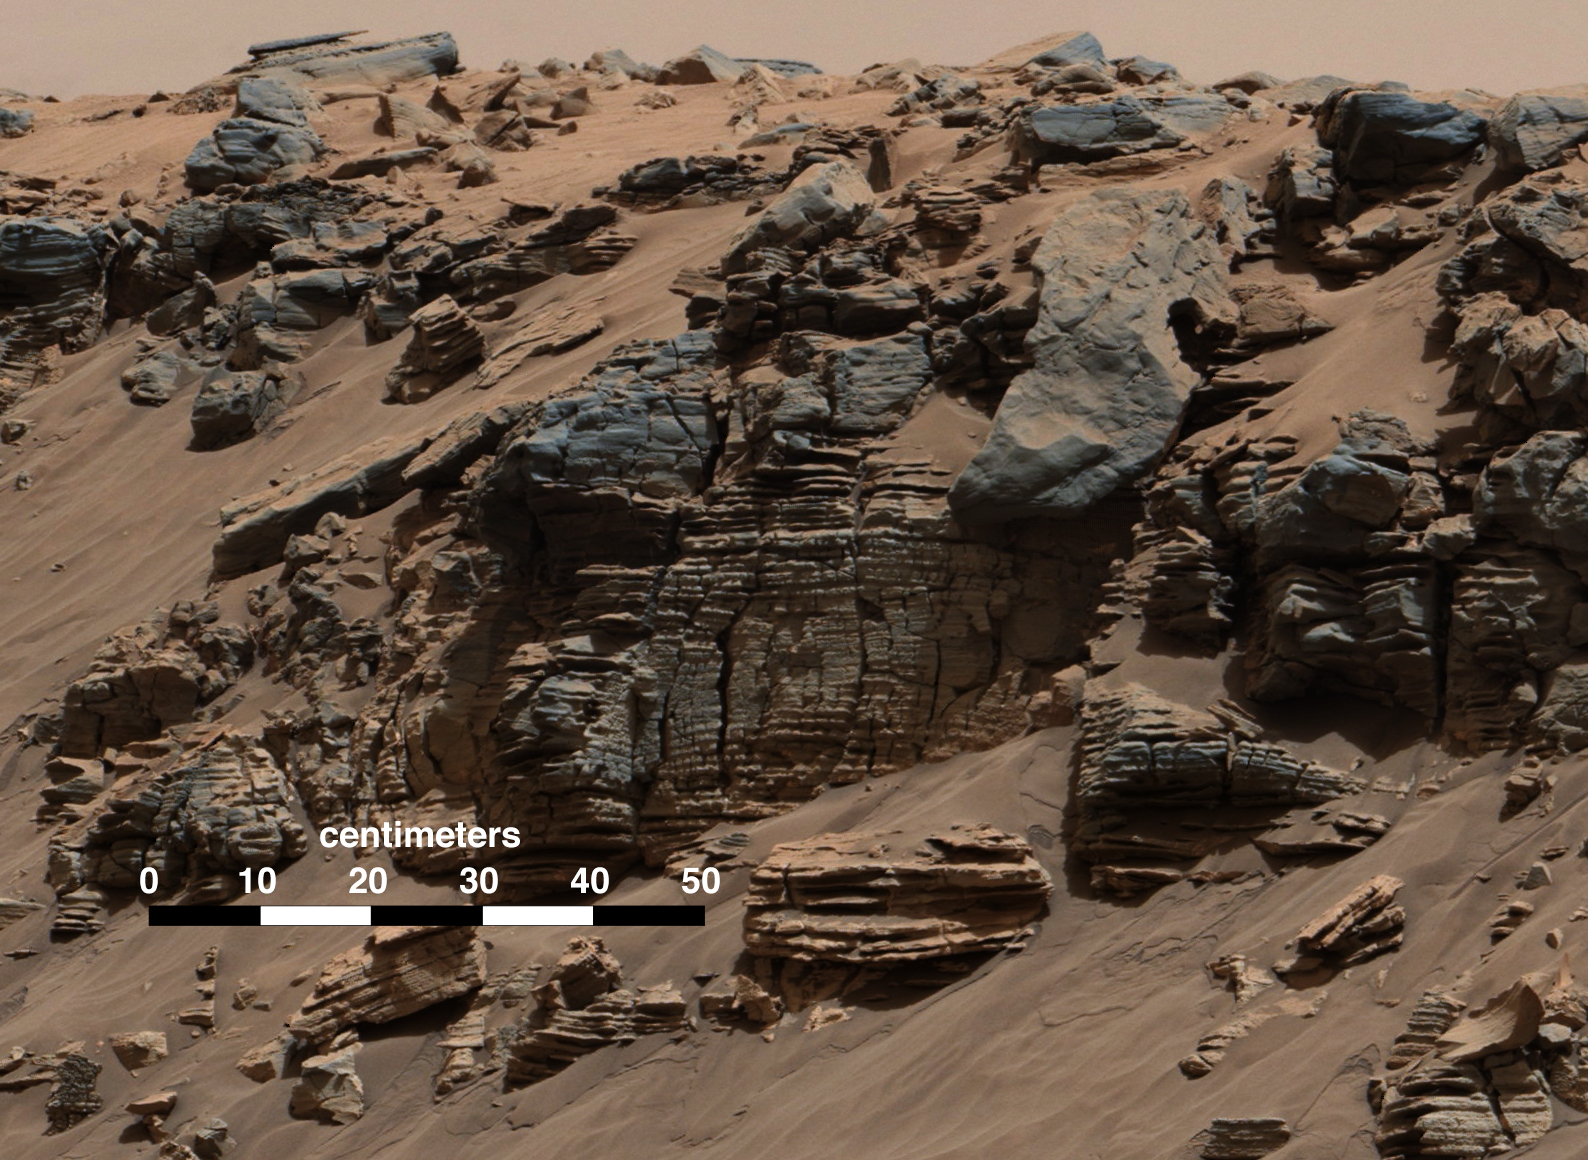 mars curiosity rover image of rocks